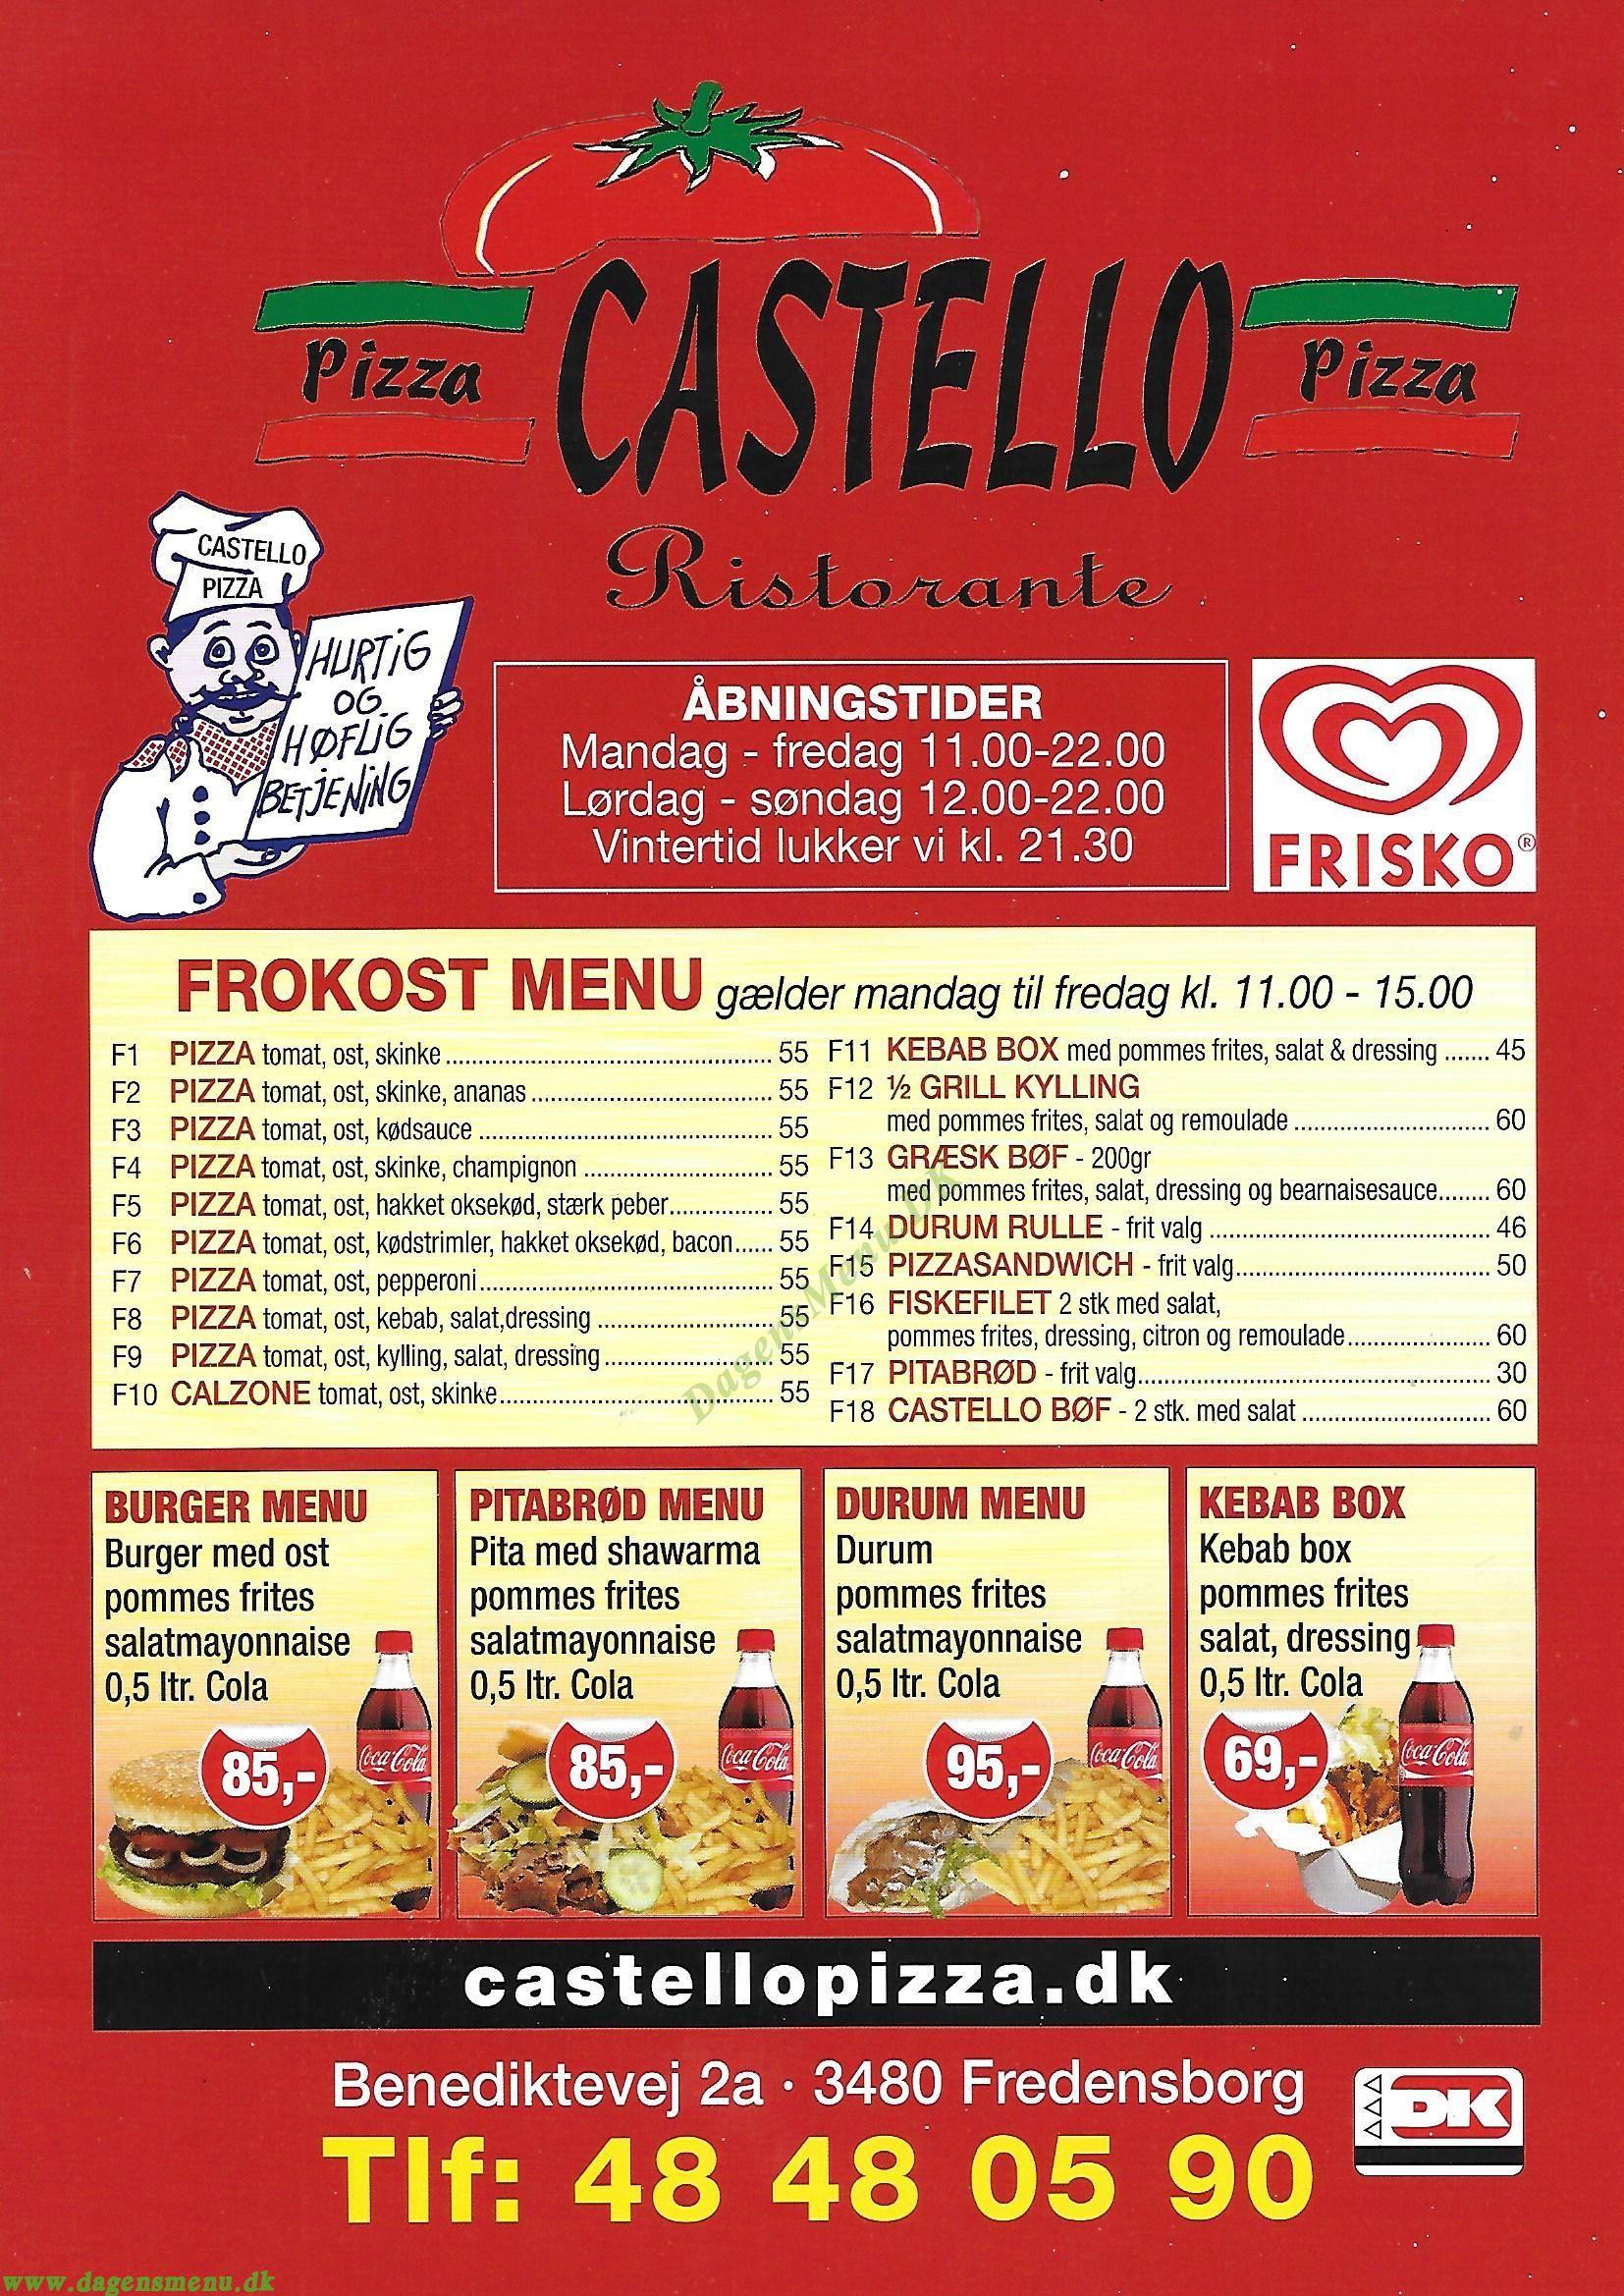 Castello Pizza - Menukort